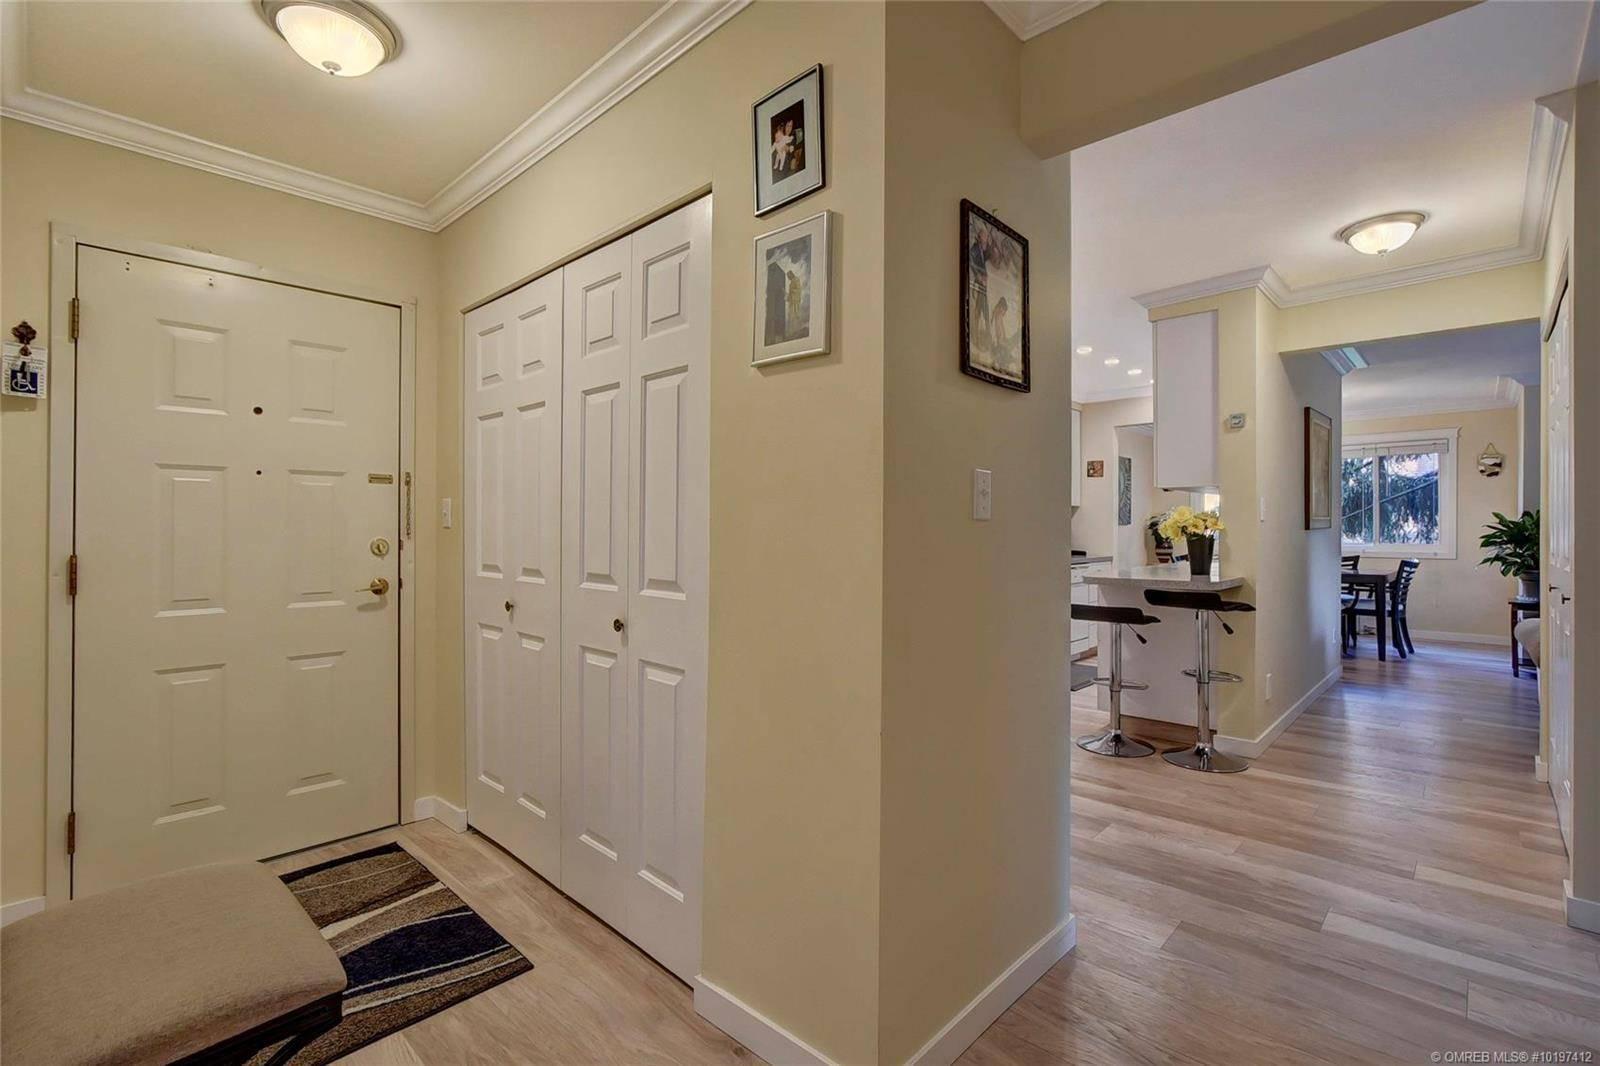 Condo for sale at 1056 Bernard Ave Unit 108 Kelowna British Columbia - MLS: 10197412